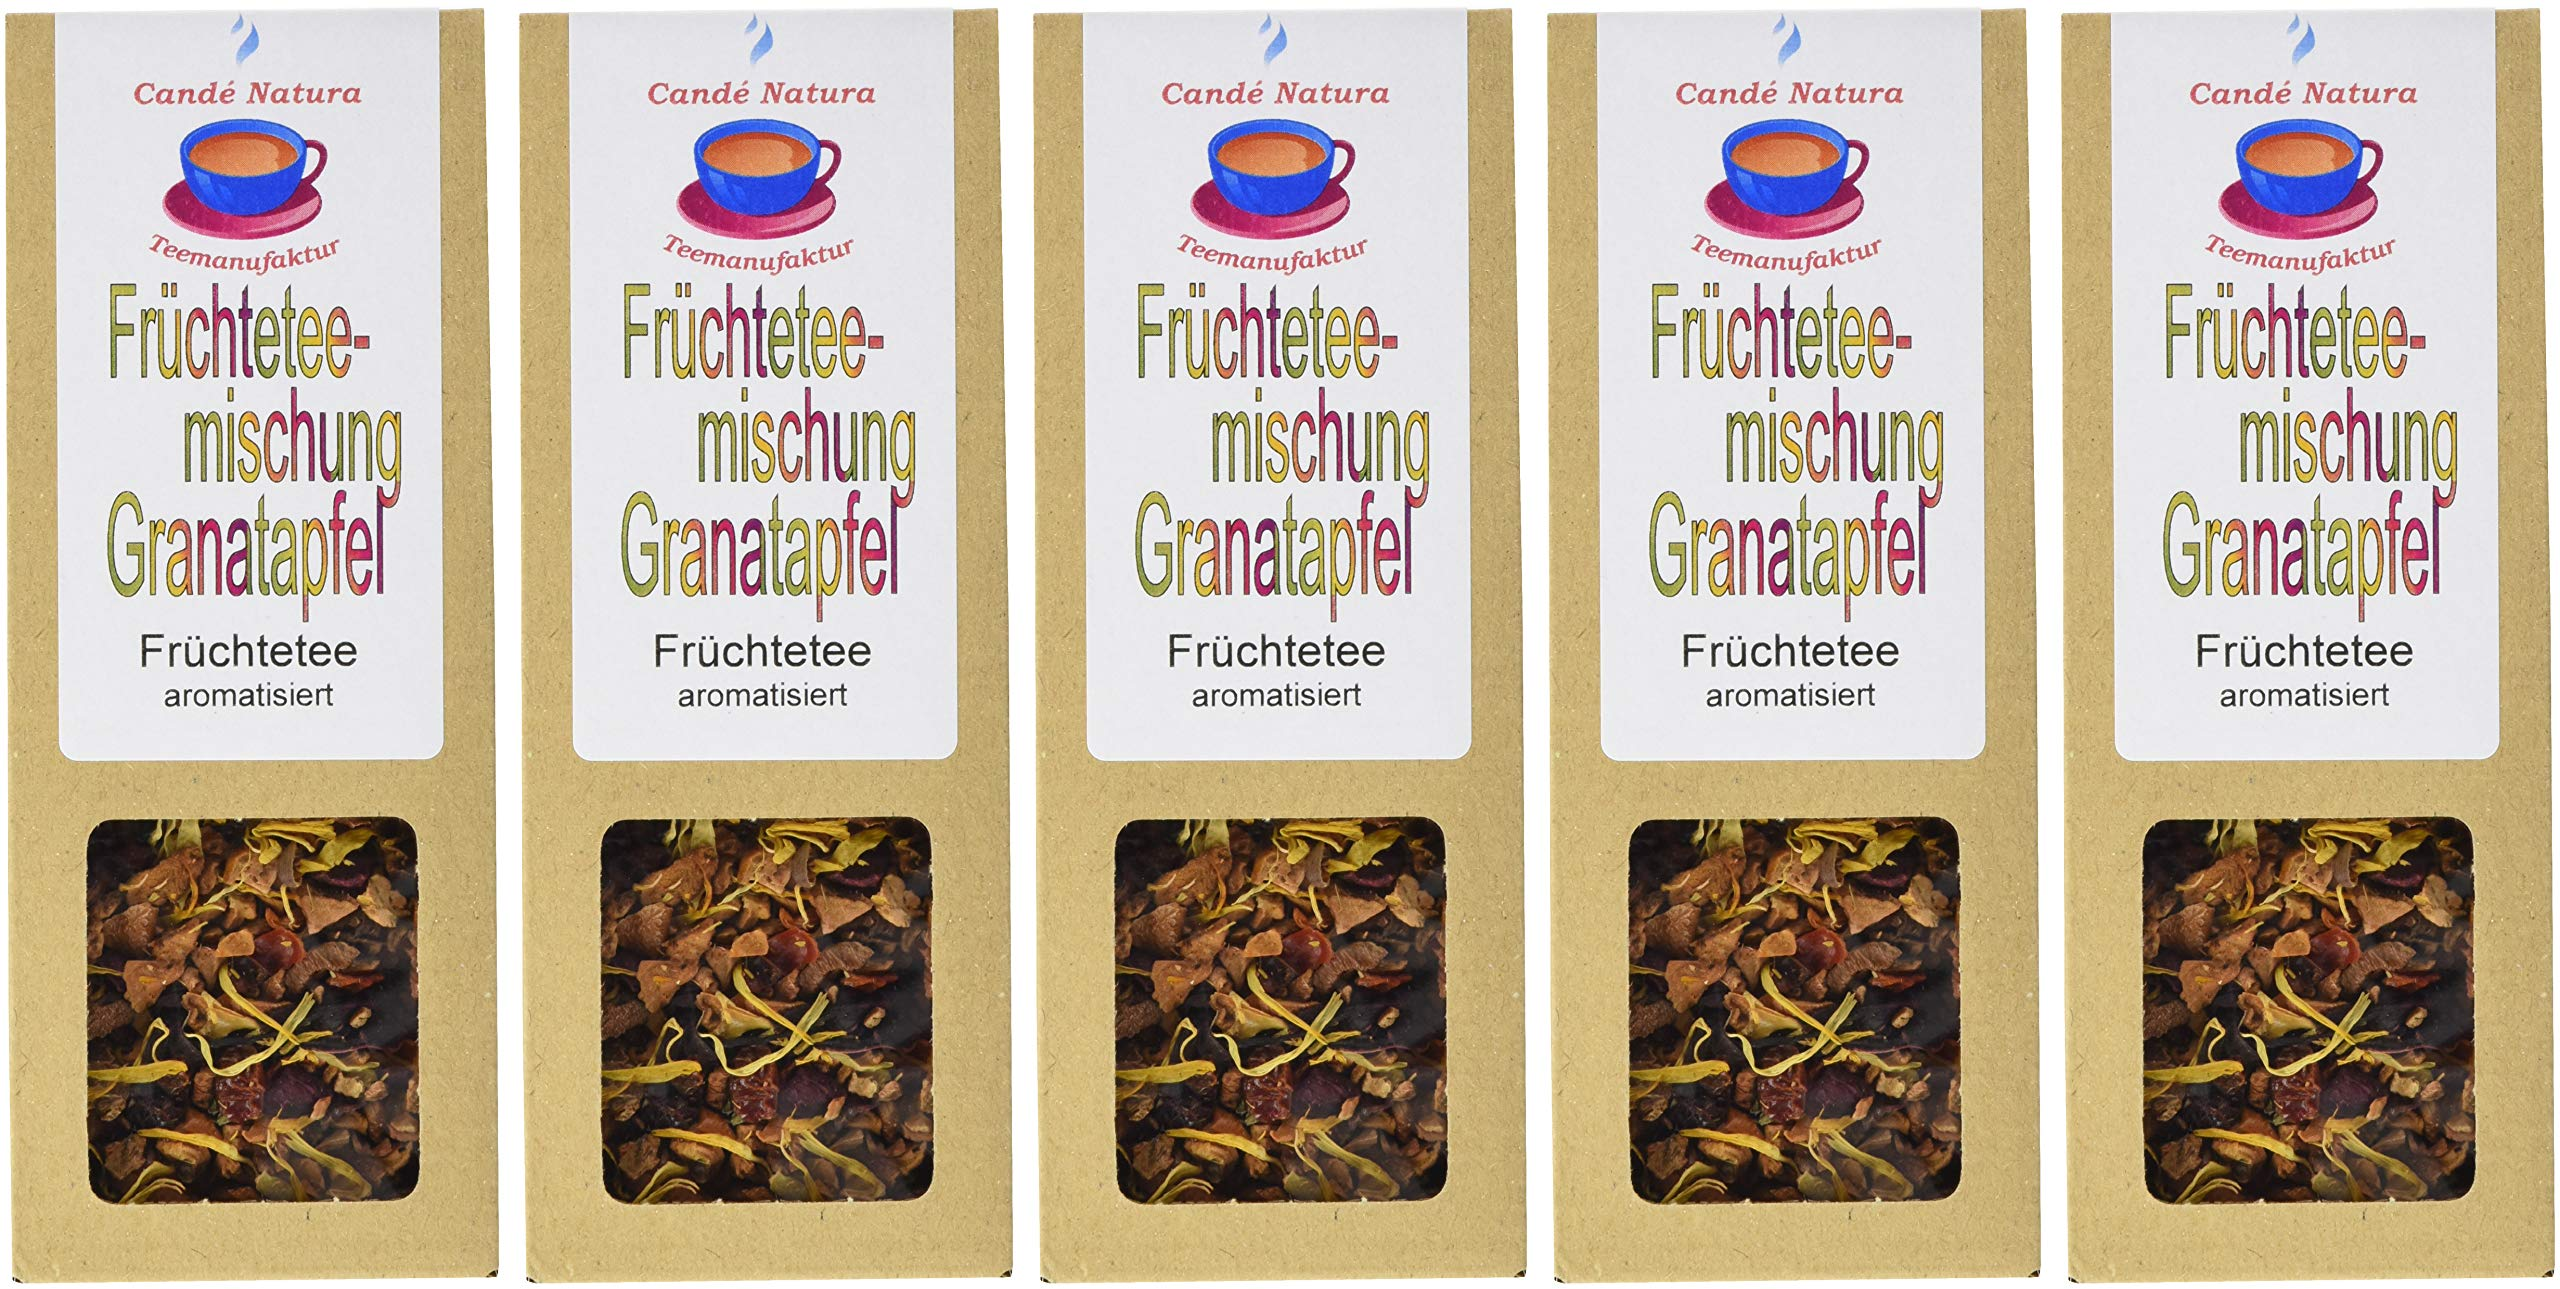 Cand-Natura-Teemanufaktur-Fruechteteemischung-mit-Granatapfelgeschmack-aromatisiert-5er-Pack-5-x-90-g